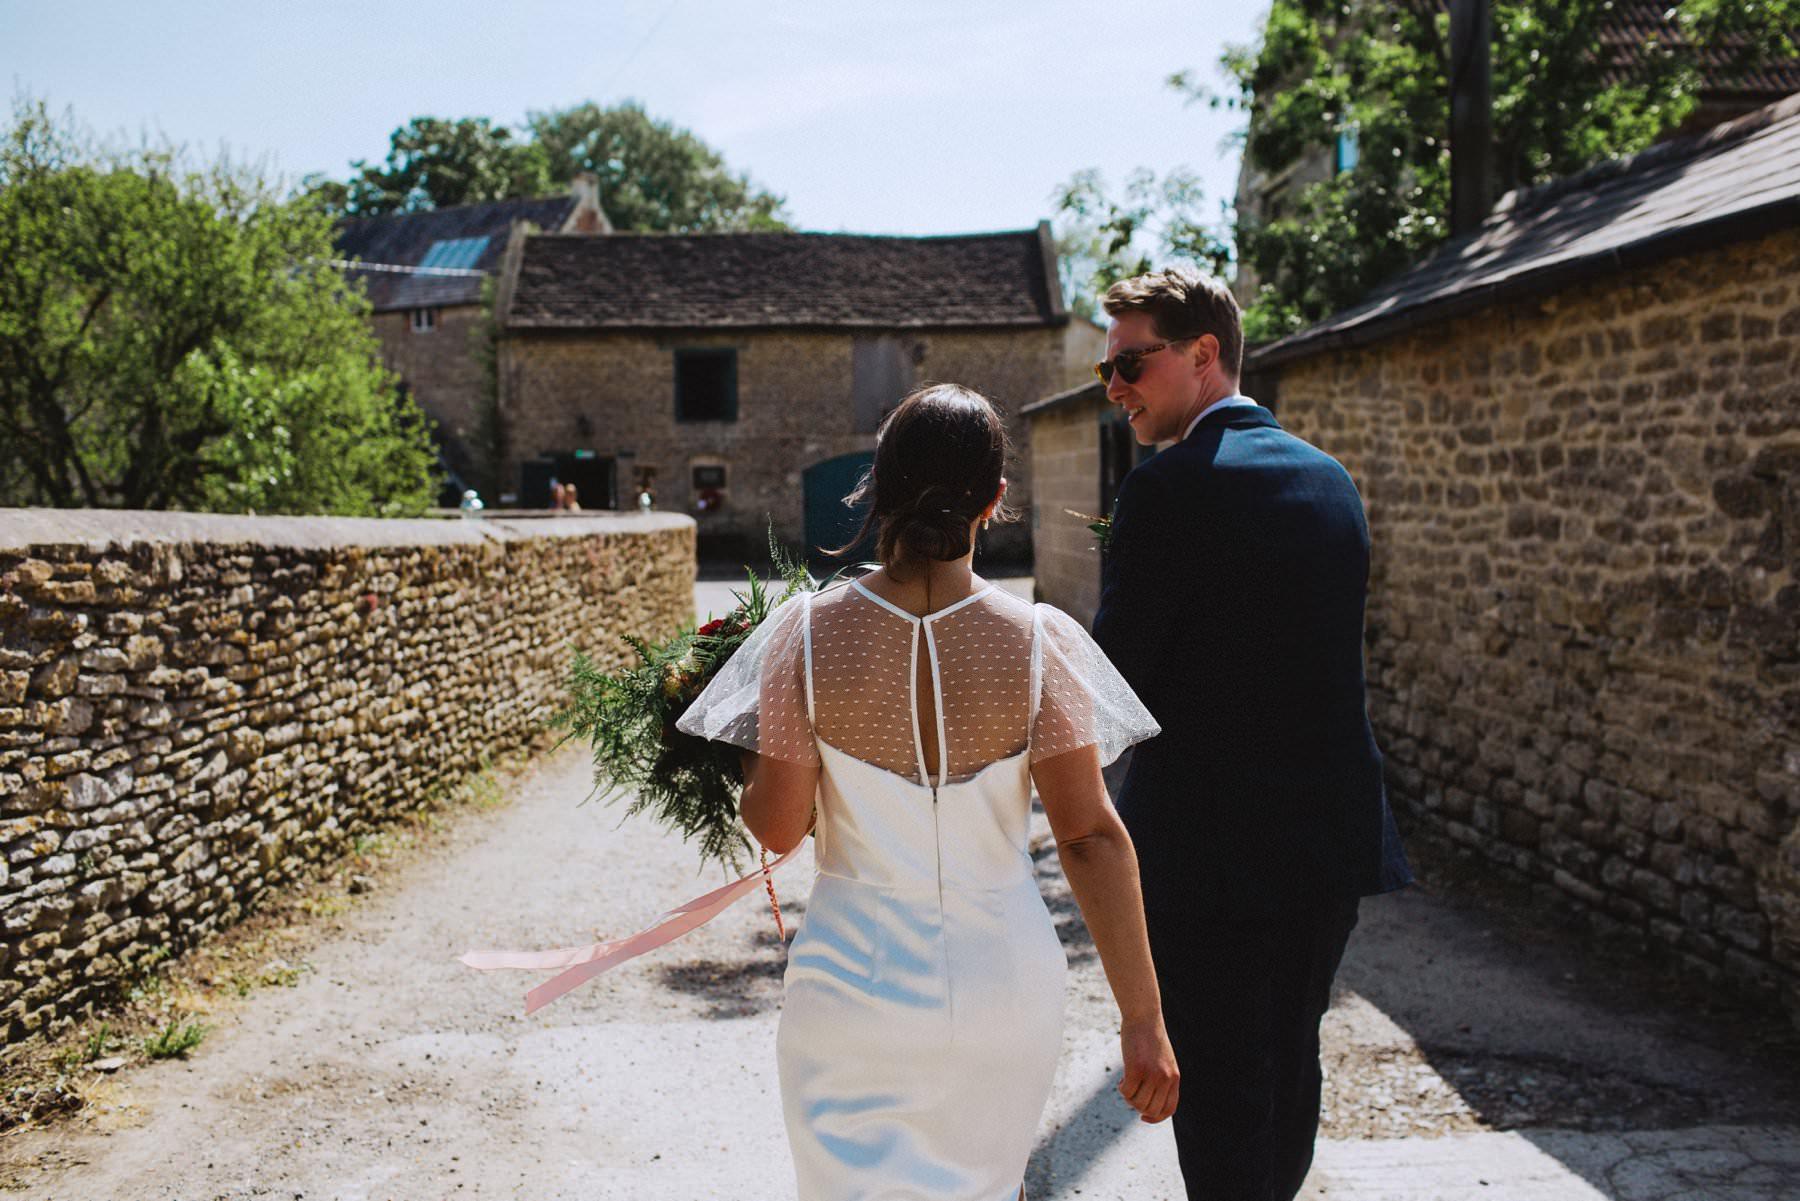 royal wedding photography at stowford manor farm